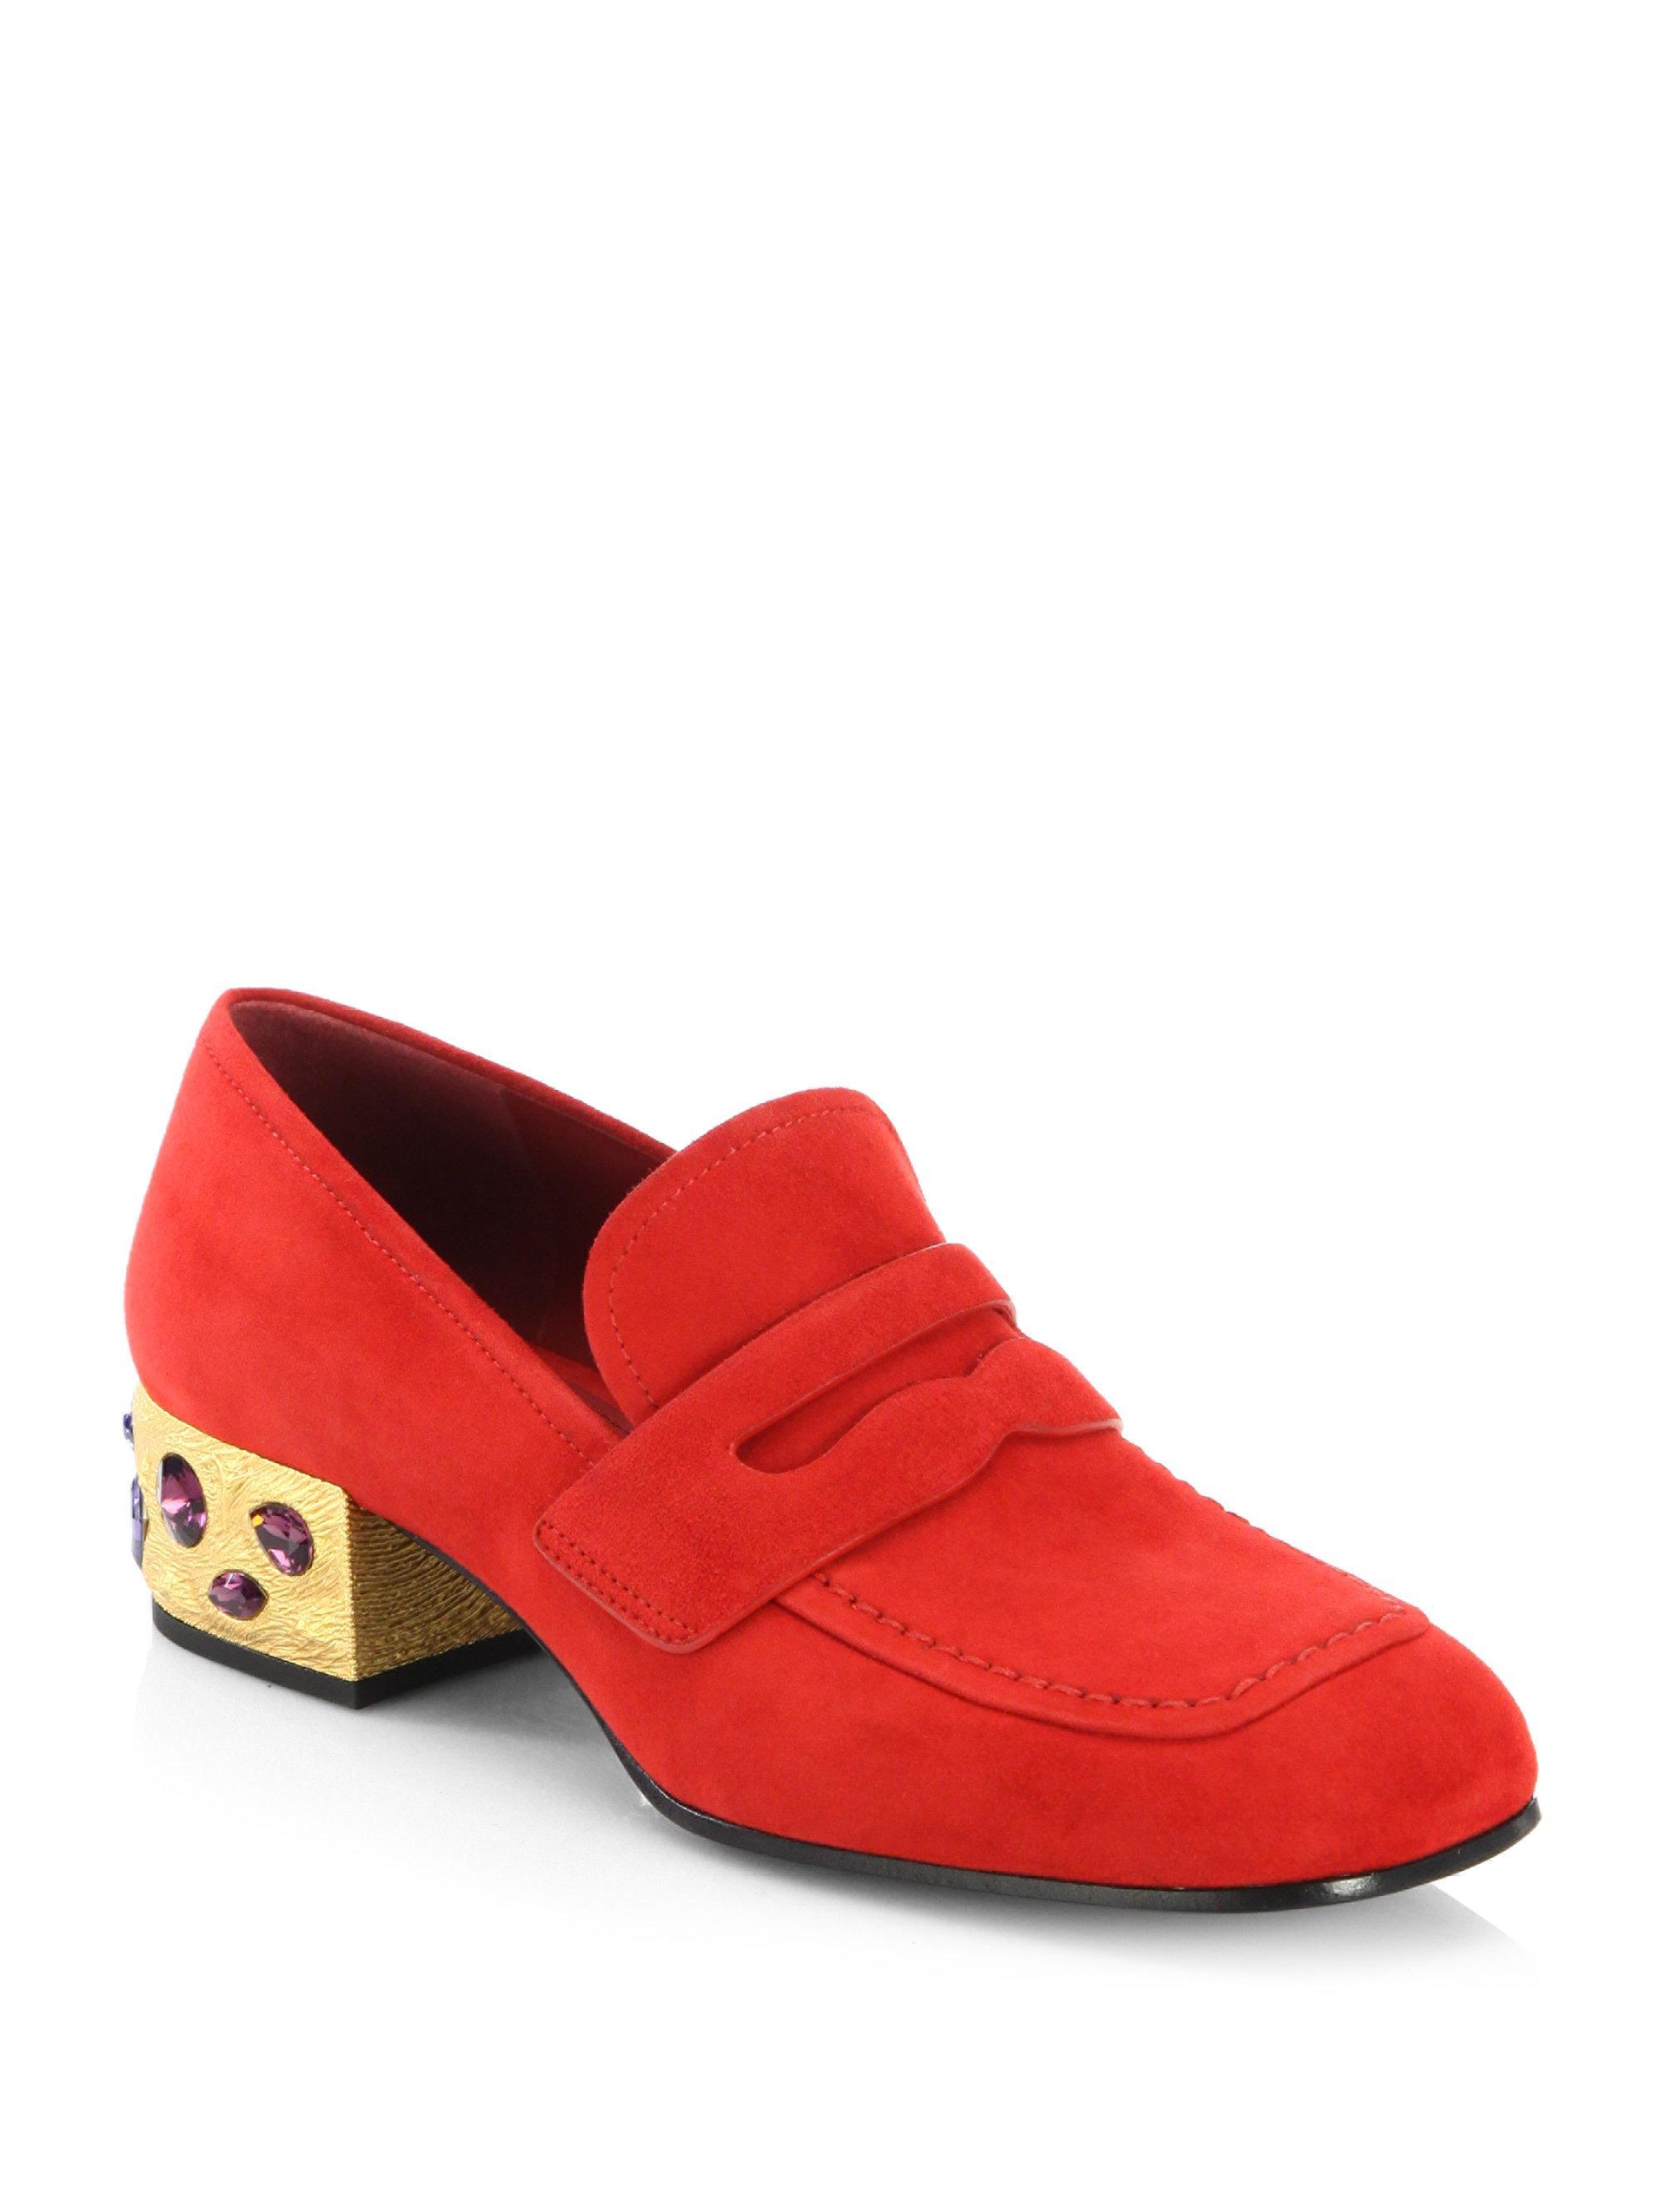 e6eedf2edf5 Lyst - Prada Jewel Heel Suede Loafer Pumps in Red